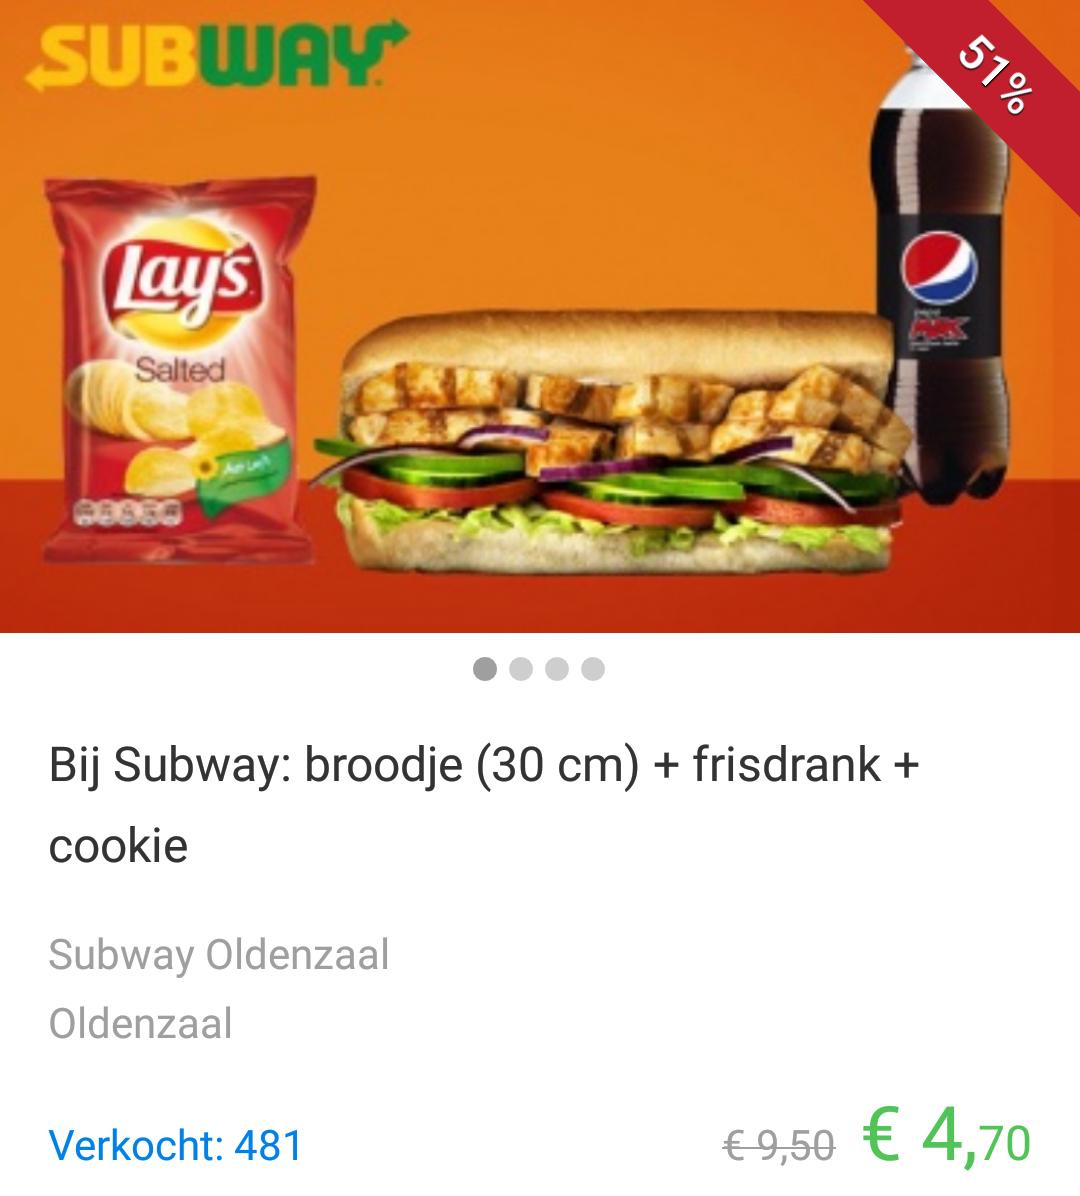 Via SocialDeal goedkope sub-menu's in Roermond, Eindhoven, Oldenzaal, Echt en Stein (groot voordeelmenu voor €4,70)